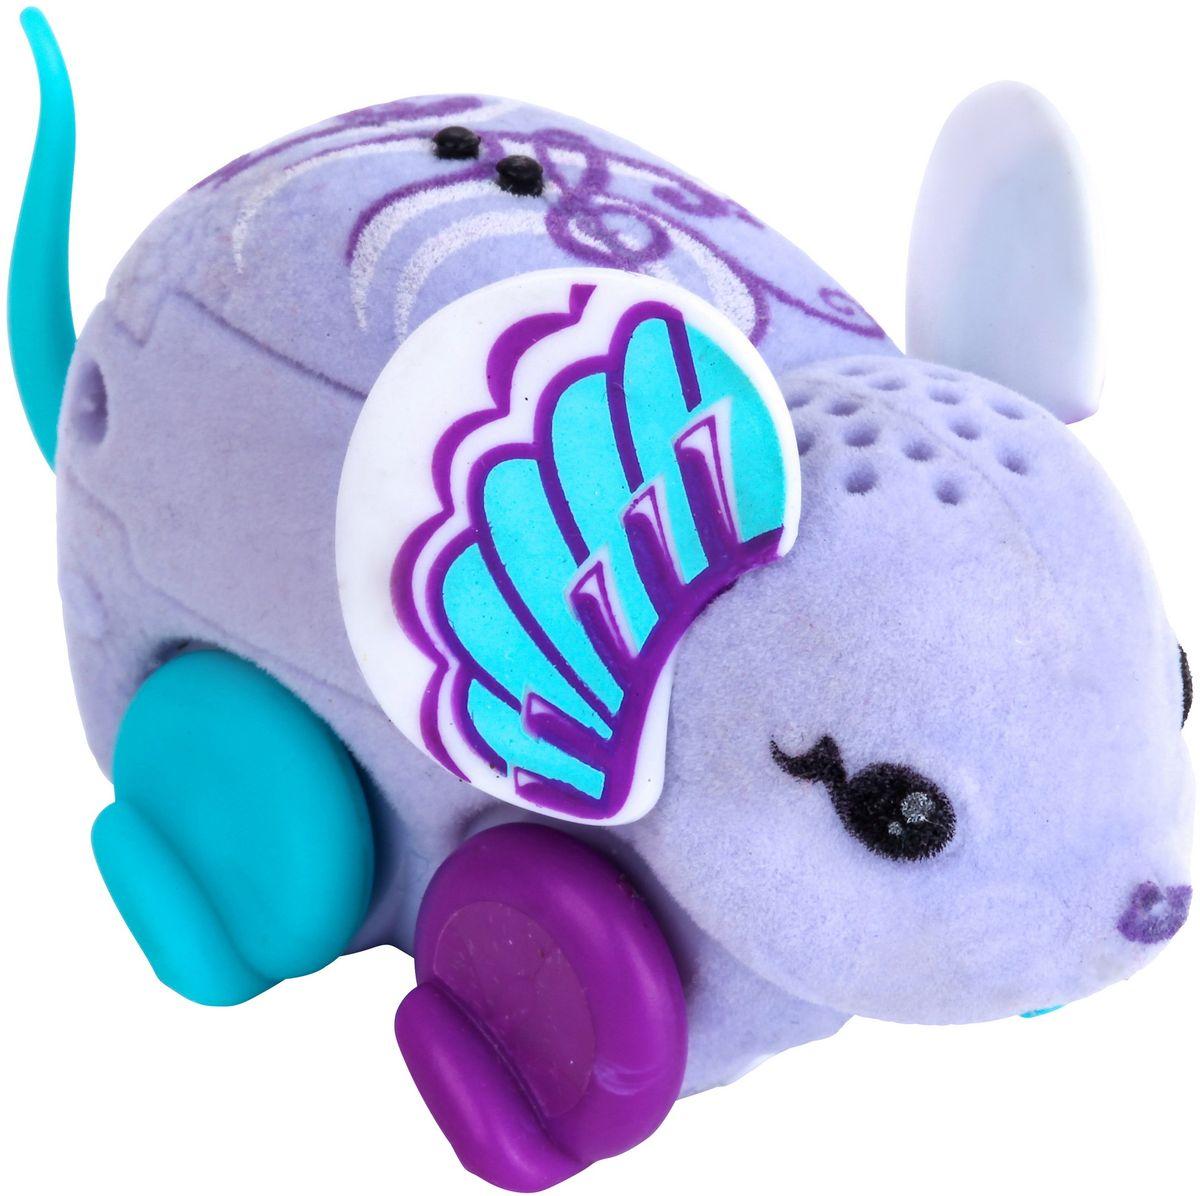 Moose Интерактивная игрушка Мышка Classical Melody - Интерактивные игрушки